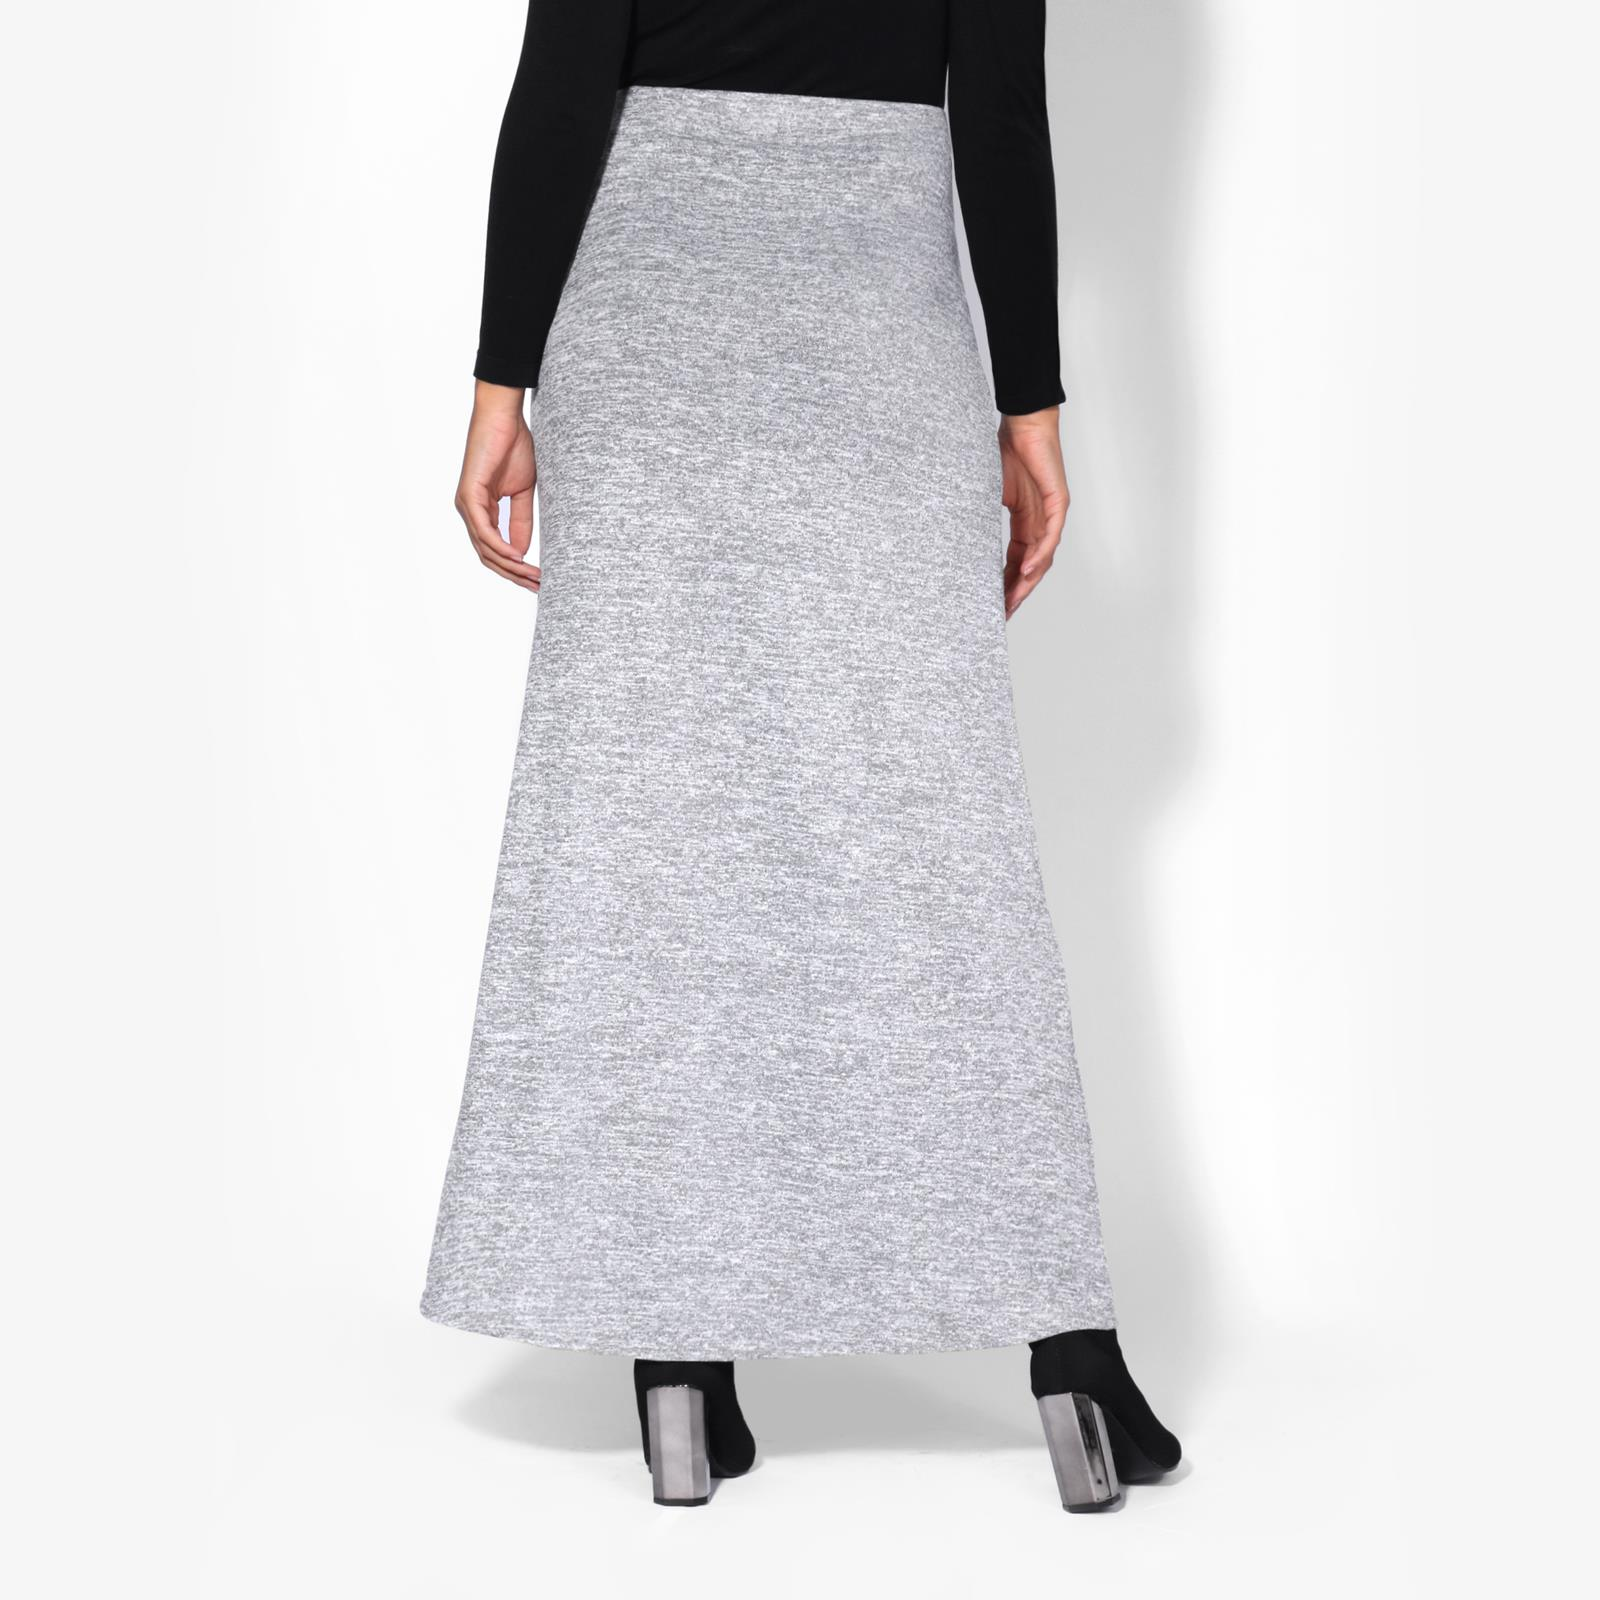 Womens-Ladies-Maxi-Skirt-High-Waist-A-Line-Long-Knit-Stretch-Bodycon-Casual-Boho thumbnail 9